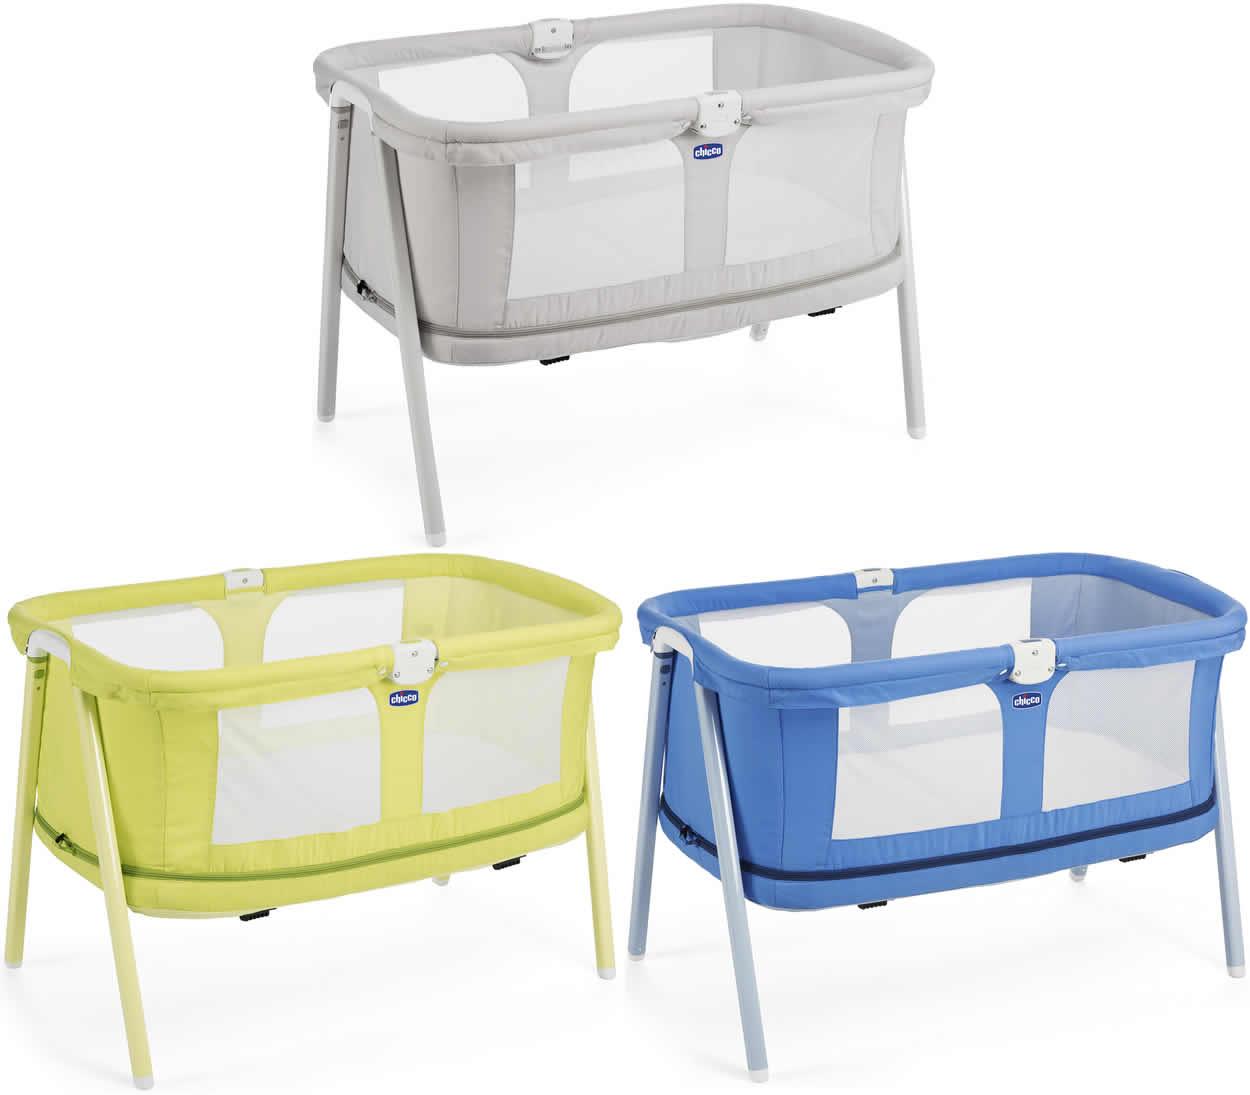 chicco lullago zip babybett bett kinderbett reisebett ebay. Black Bedroom Furniture Sets. Home Design Ideas